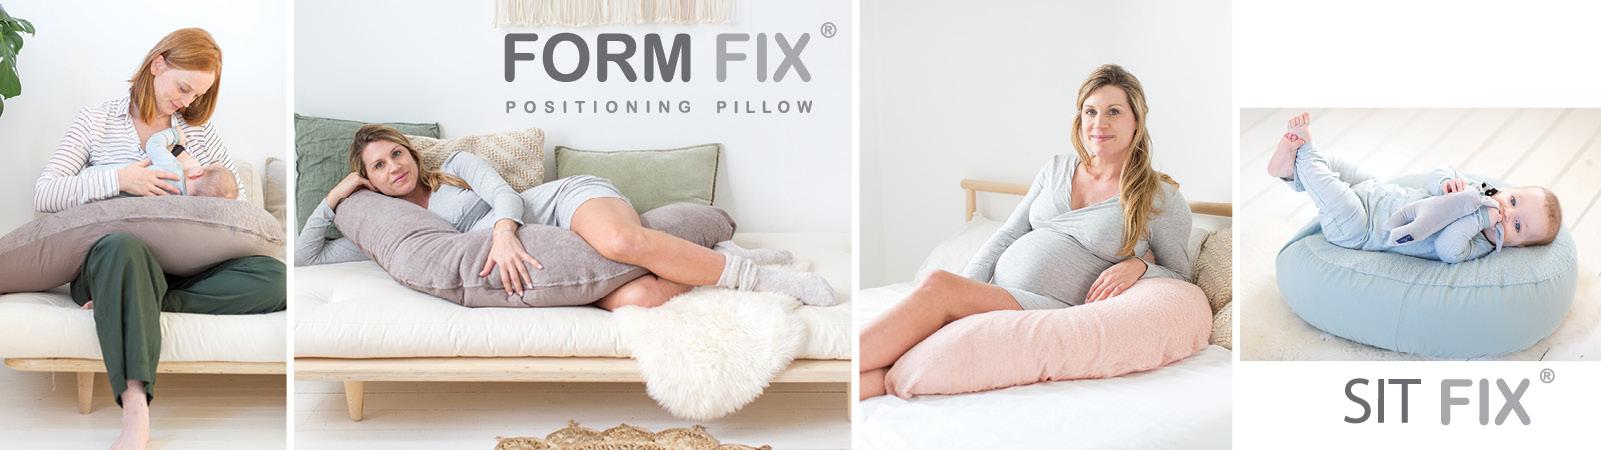 Form Fix®